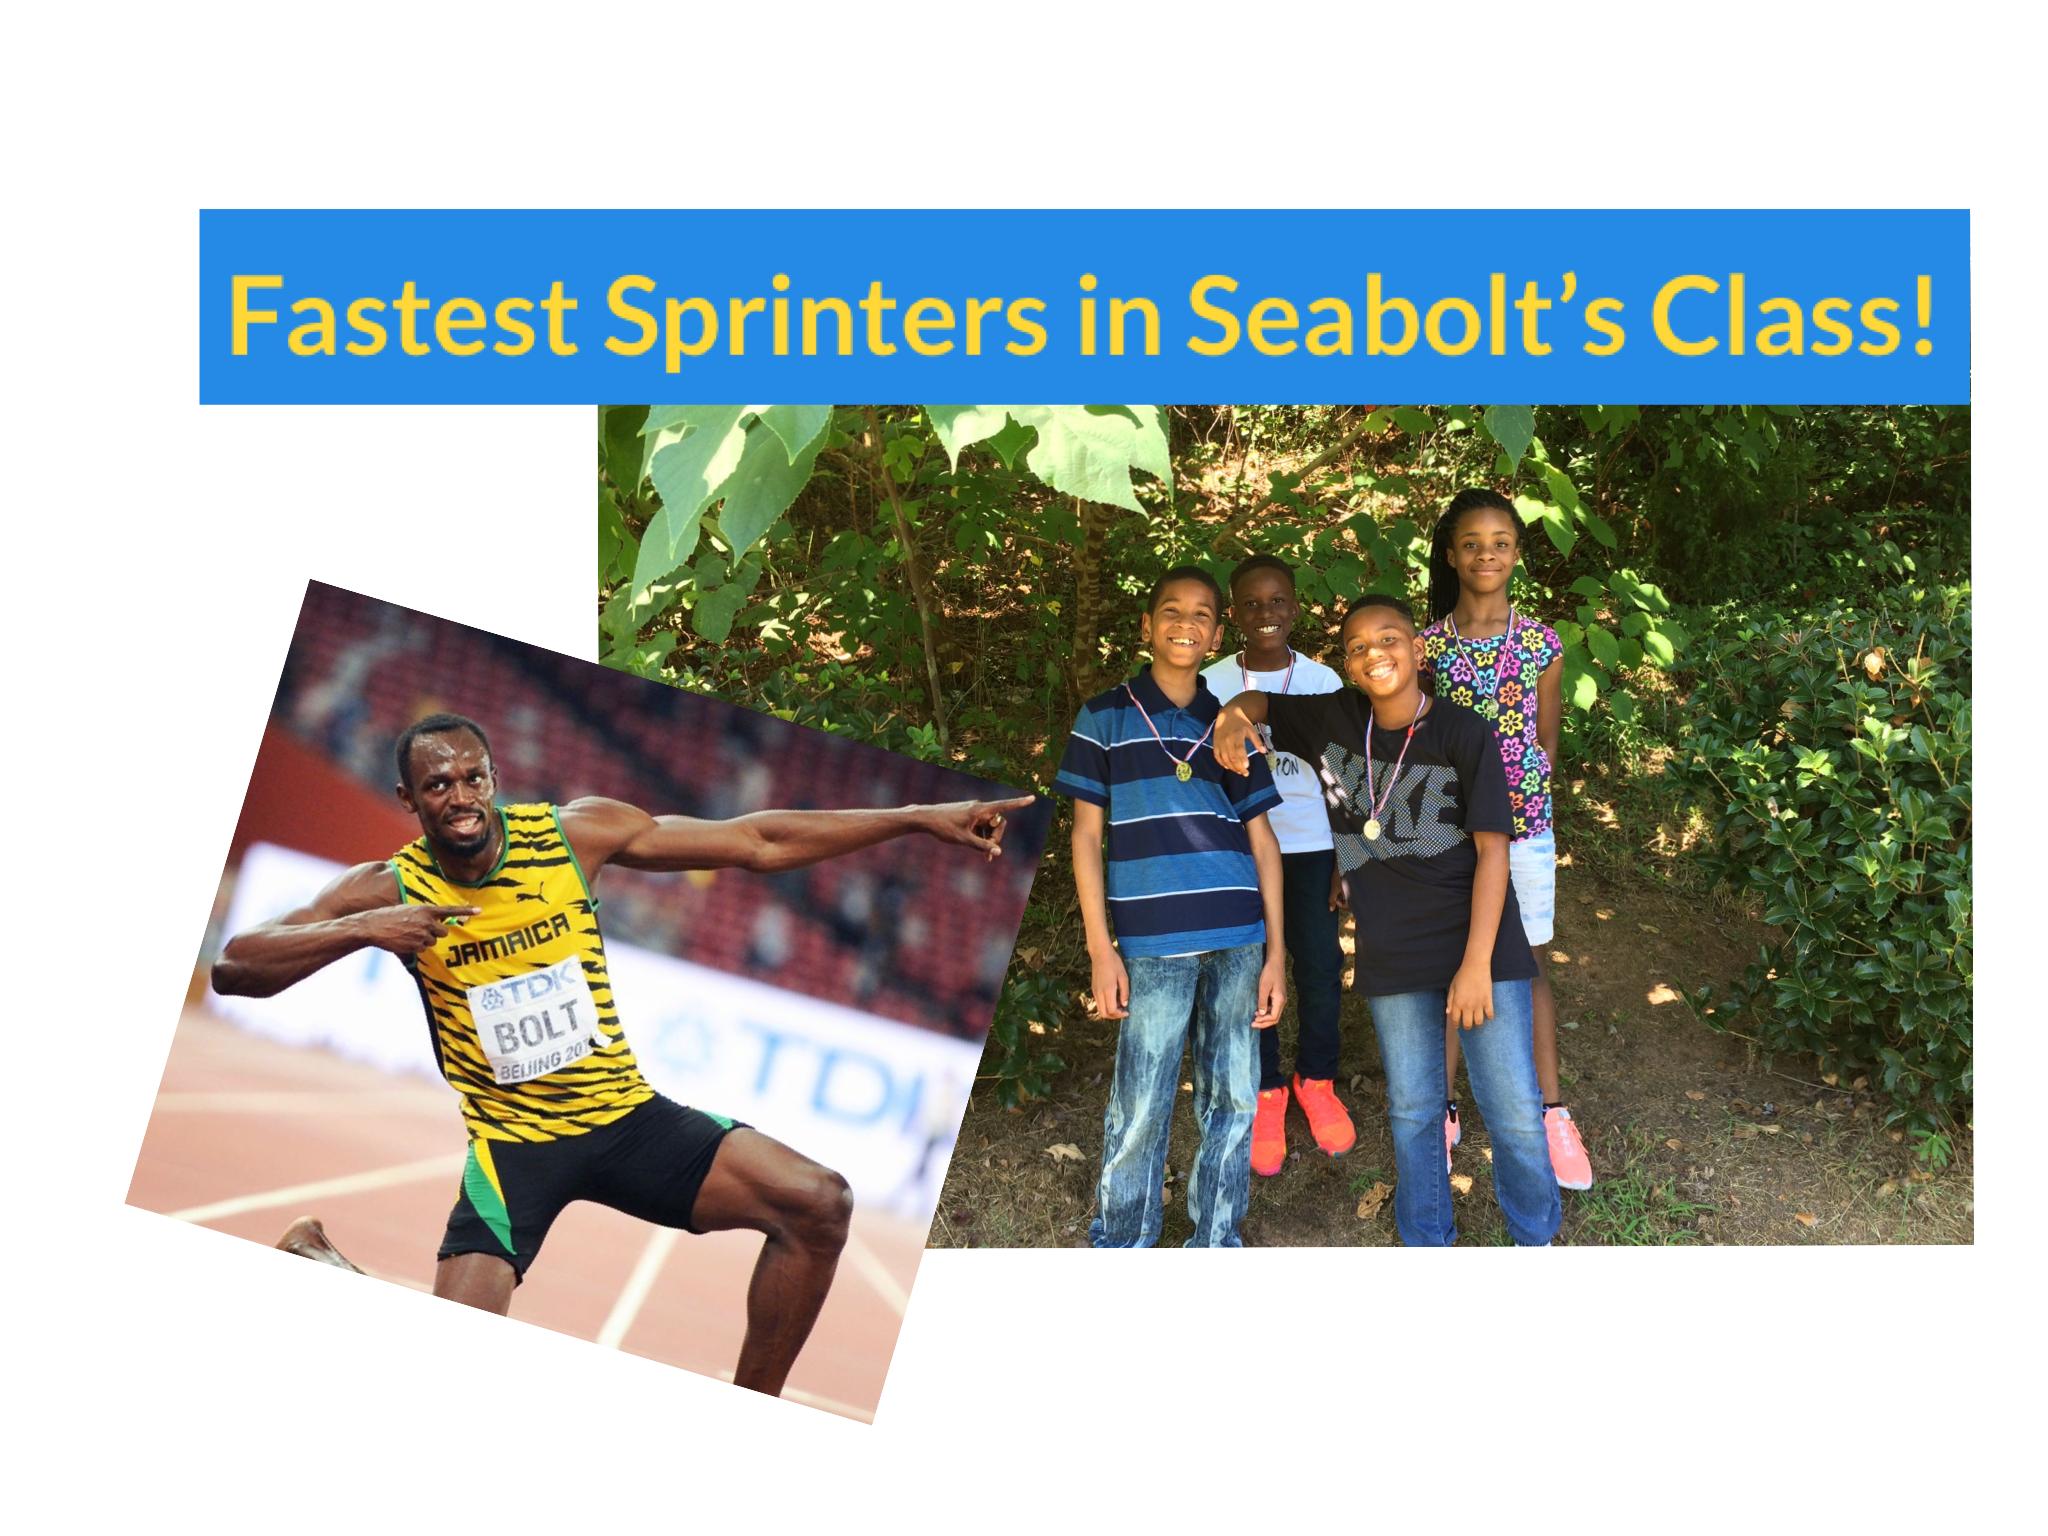 Sprinters-1 (1)